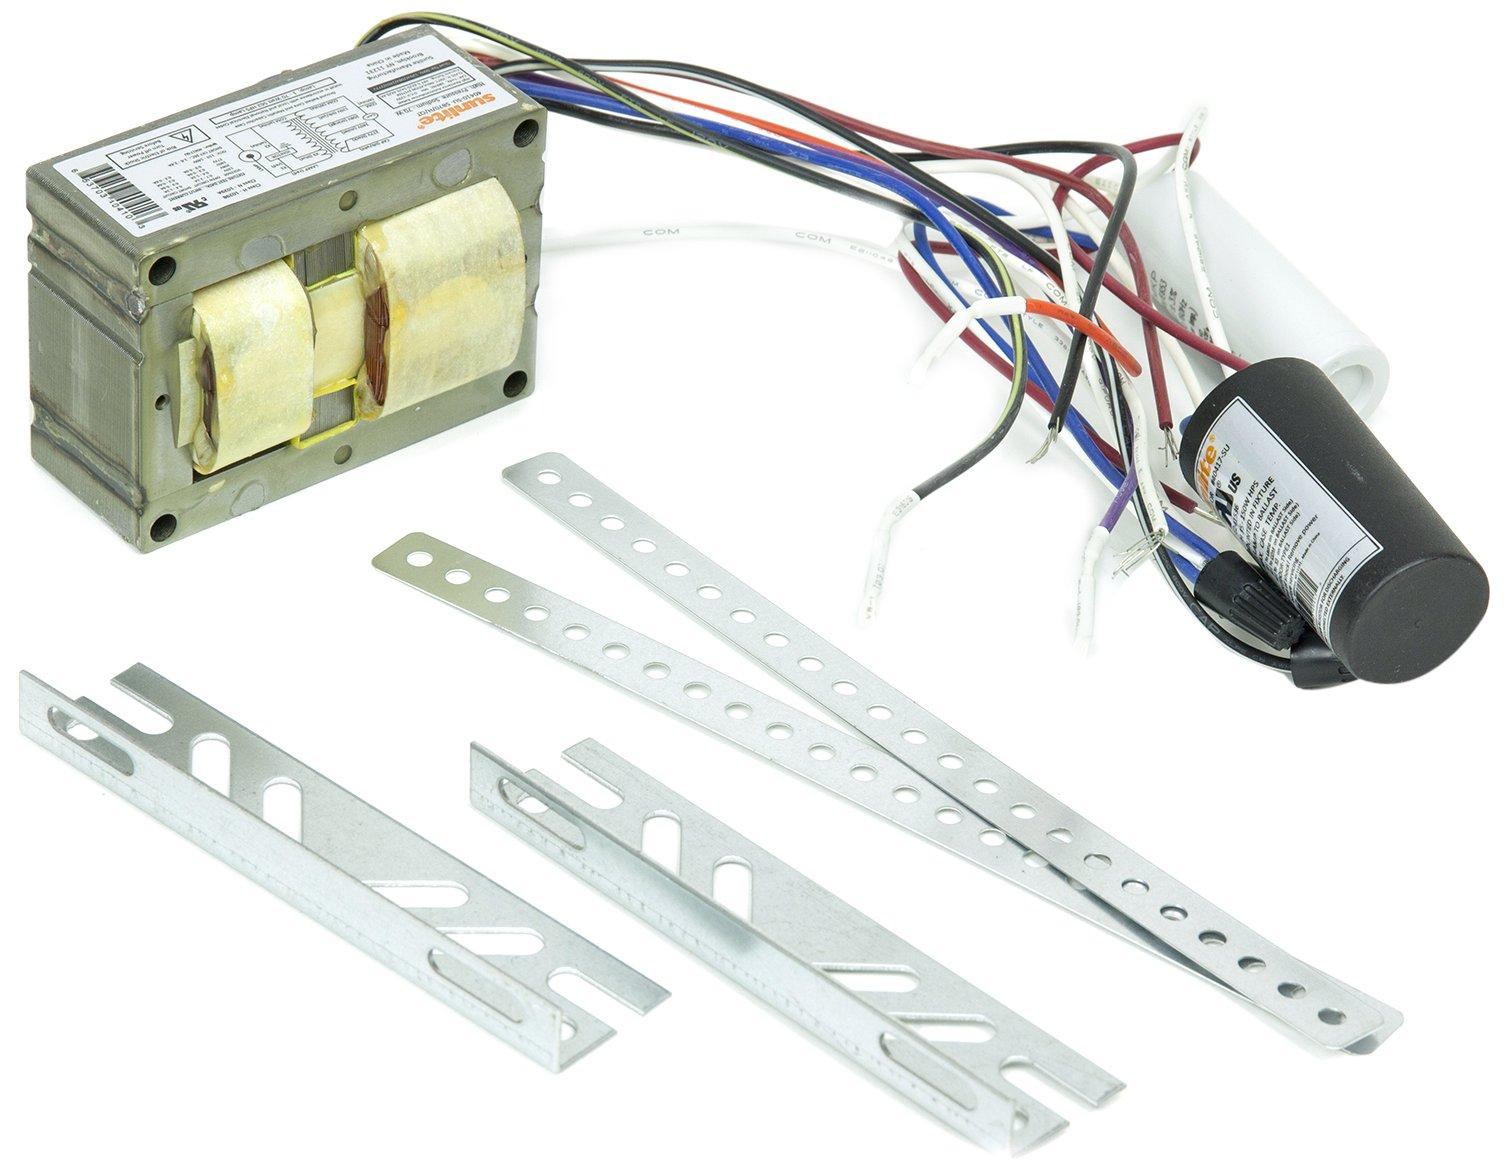 Sunlite 40410-SU SB70/H/QT 70-watt High Pressure Sodium Ballast Quad Tap Ballast Kit, Multi volt